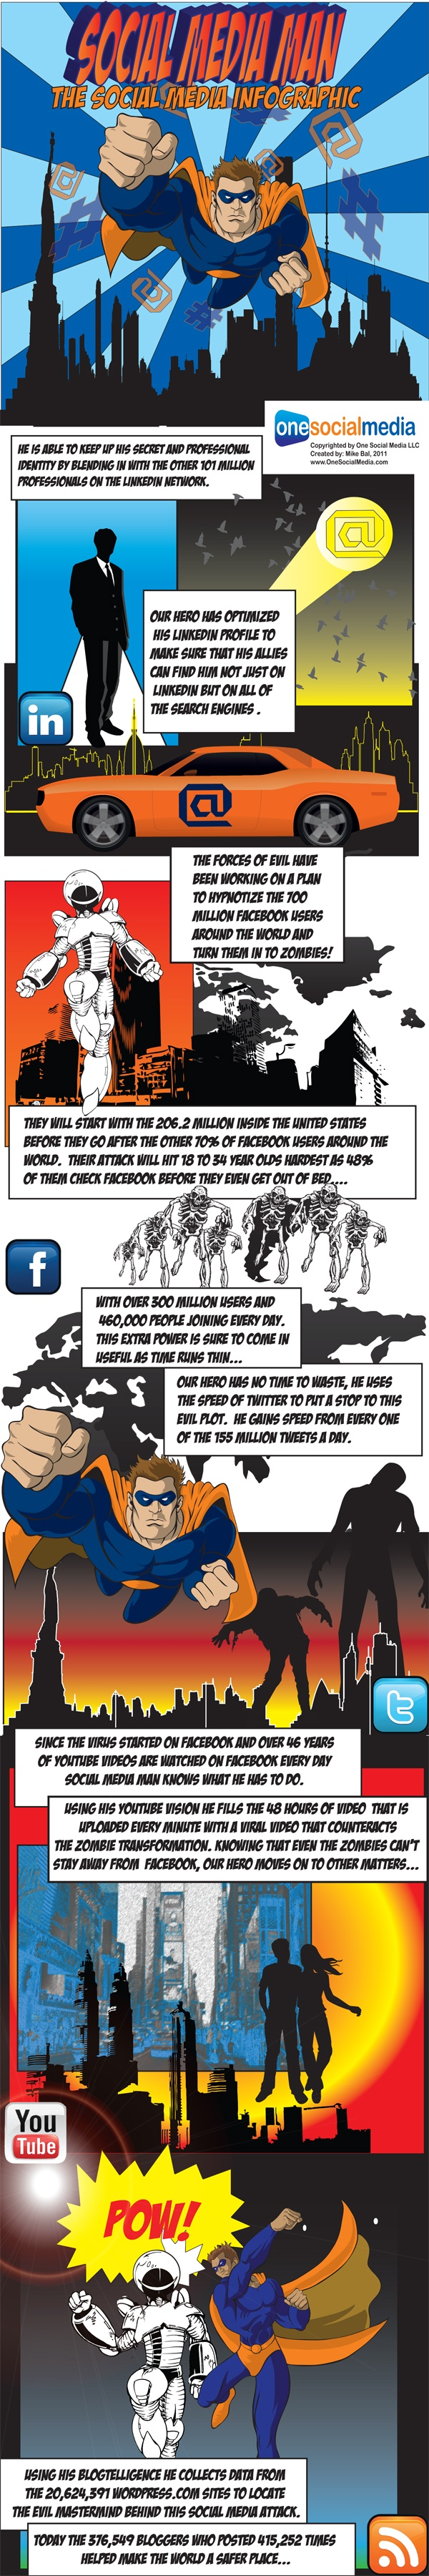 Social Media Man! (Infographic) | www.onesocialmedi...